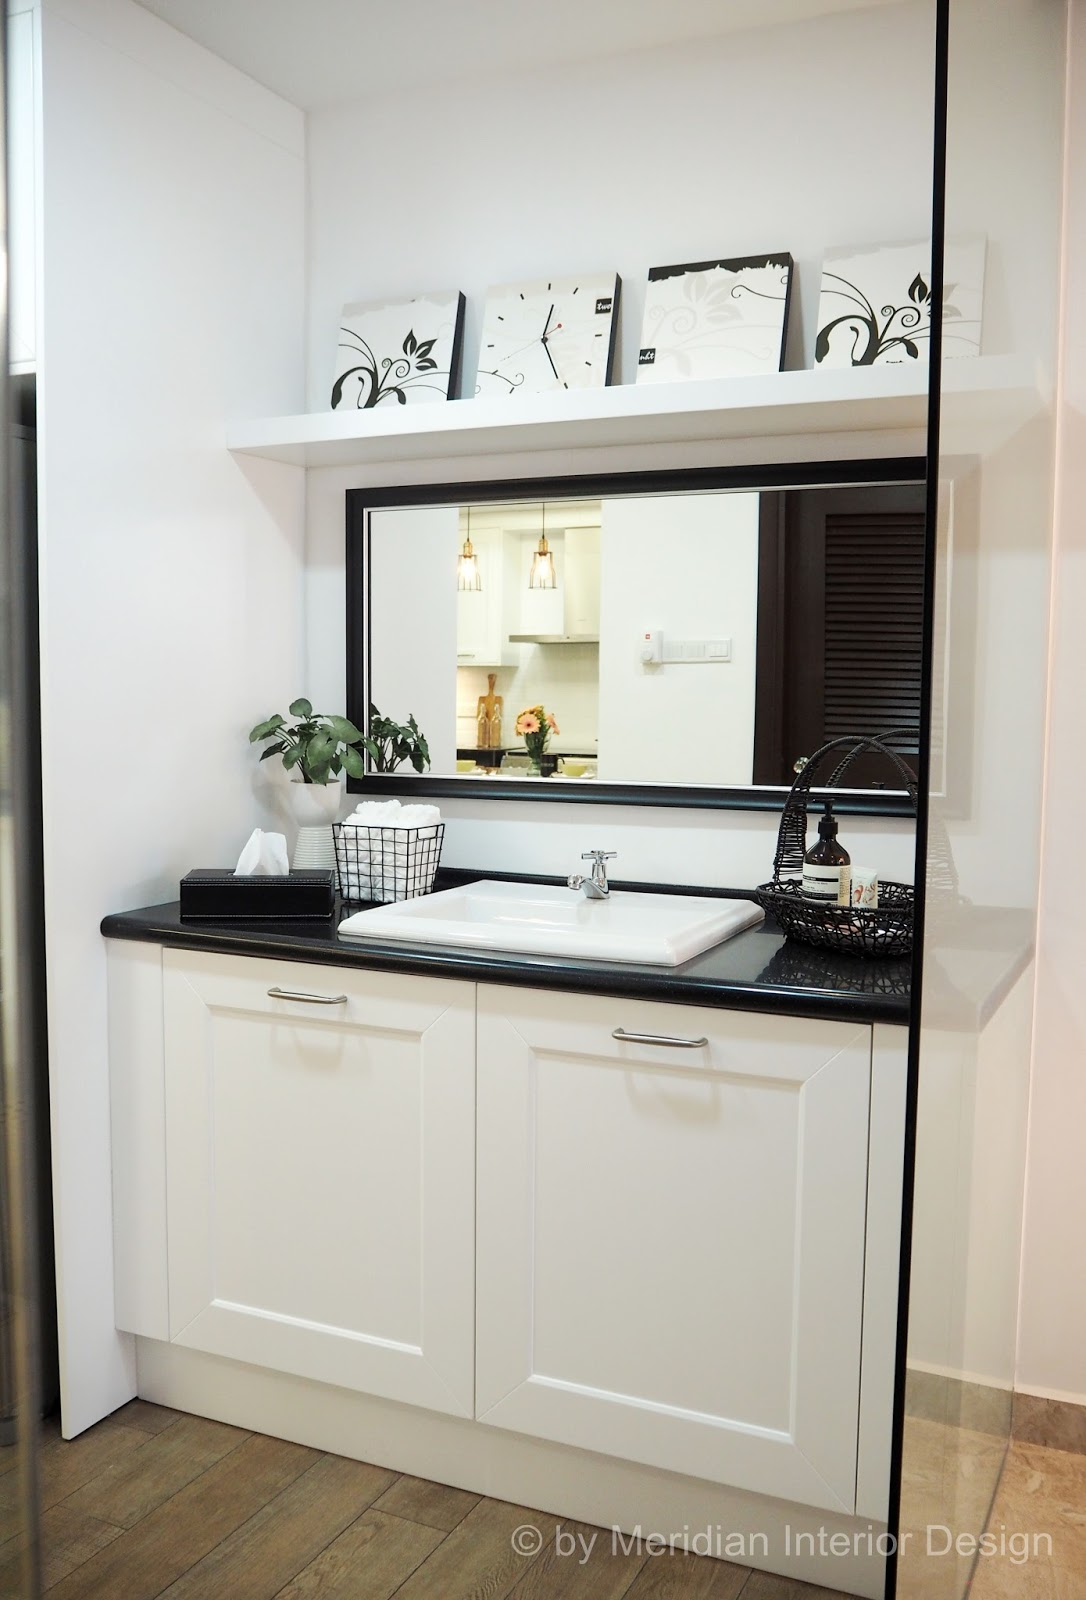 Contemporary Kitchen Interior Design: Interior Design And Kitchen Design, In Kuala